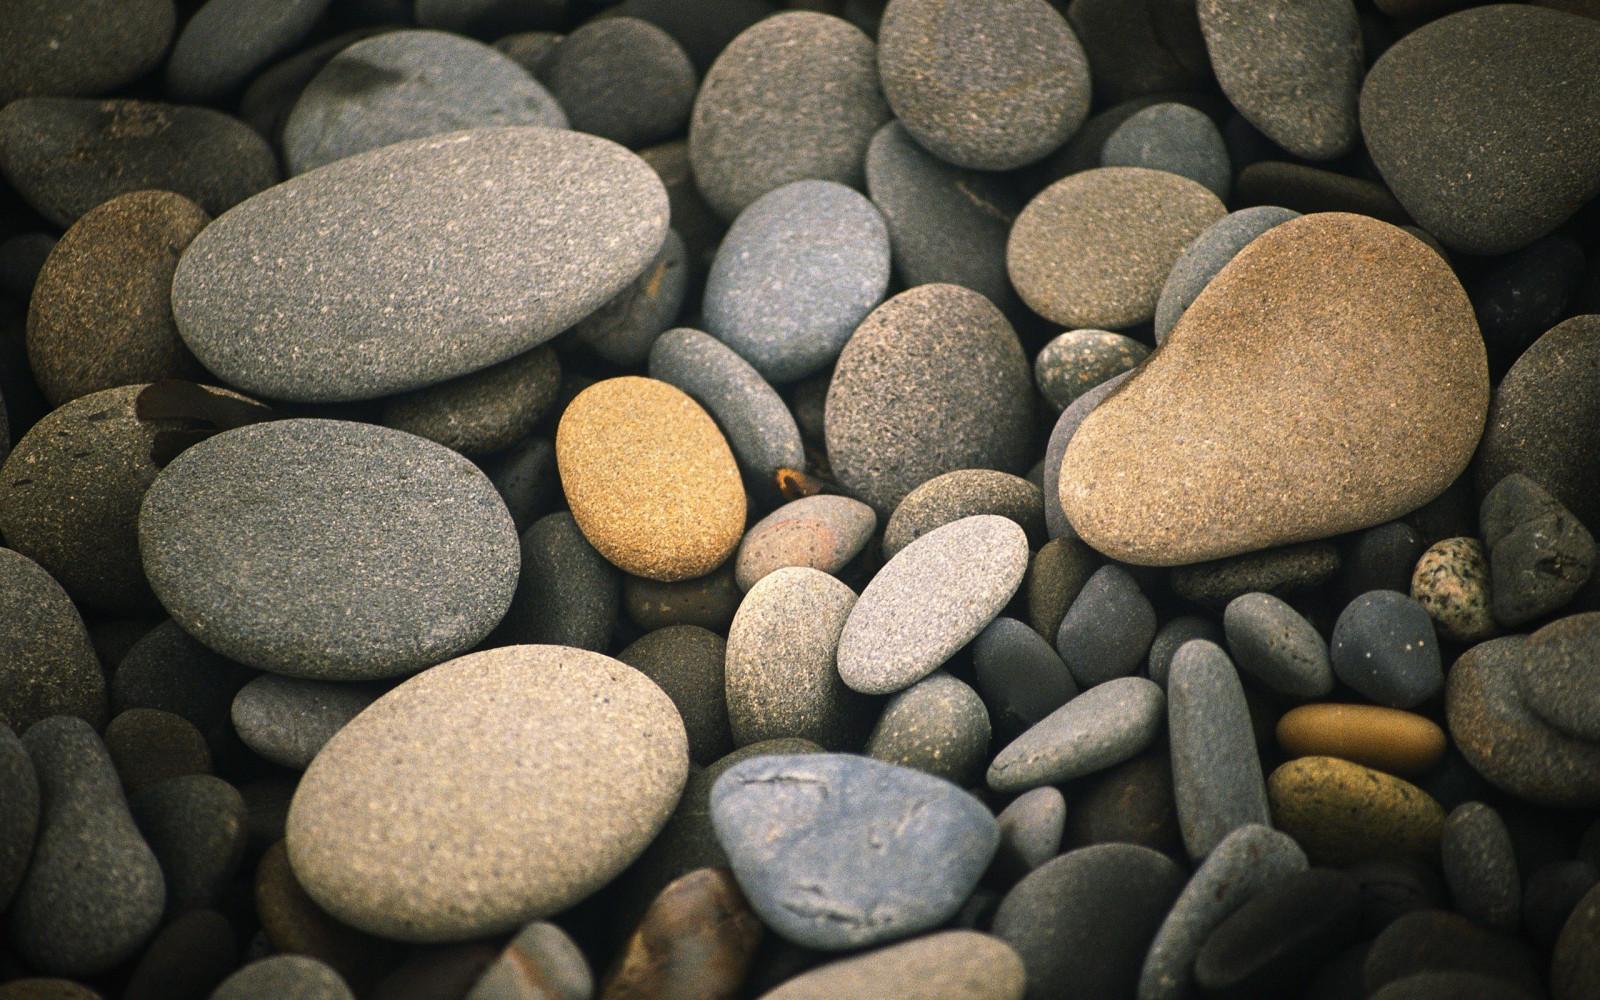 Wallpaper Batu Alam Kerikil Skema Batu Besar Bahan